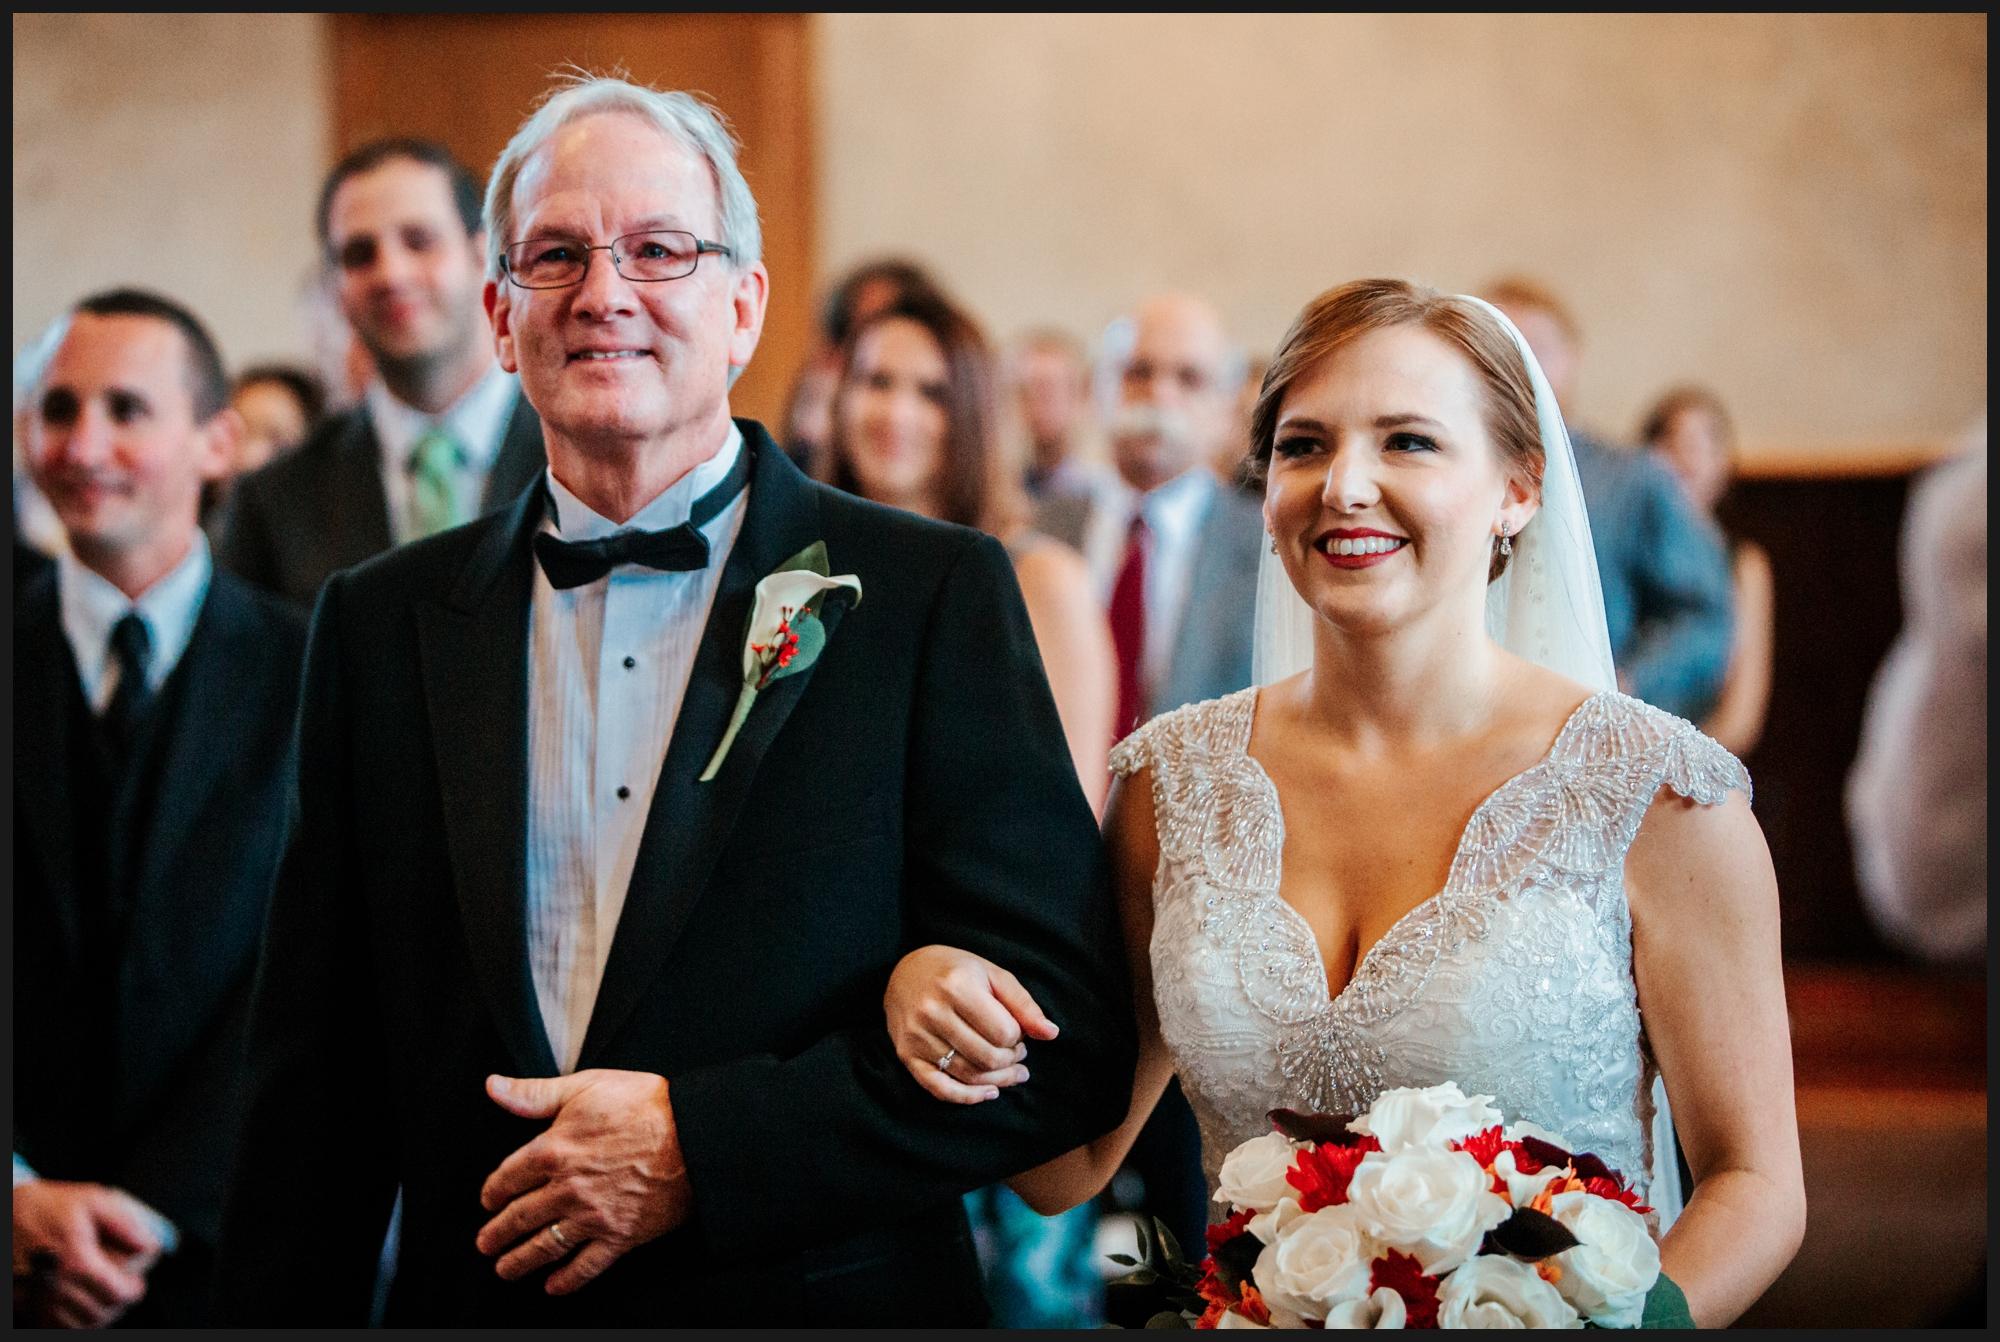 Orlando-Wedding-Photographer-destination-wedding-photographer-florida-wedding-photographer-bohemian-wedding-photographer_0624.jpg